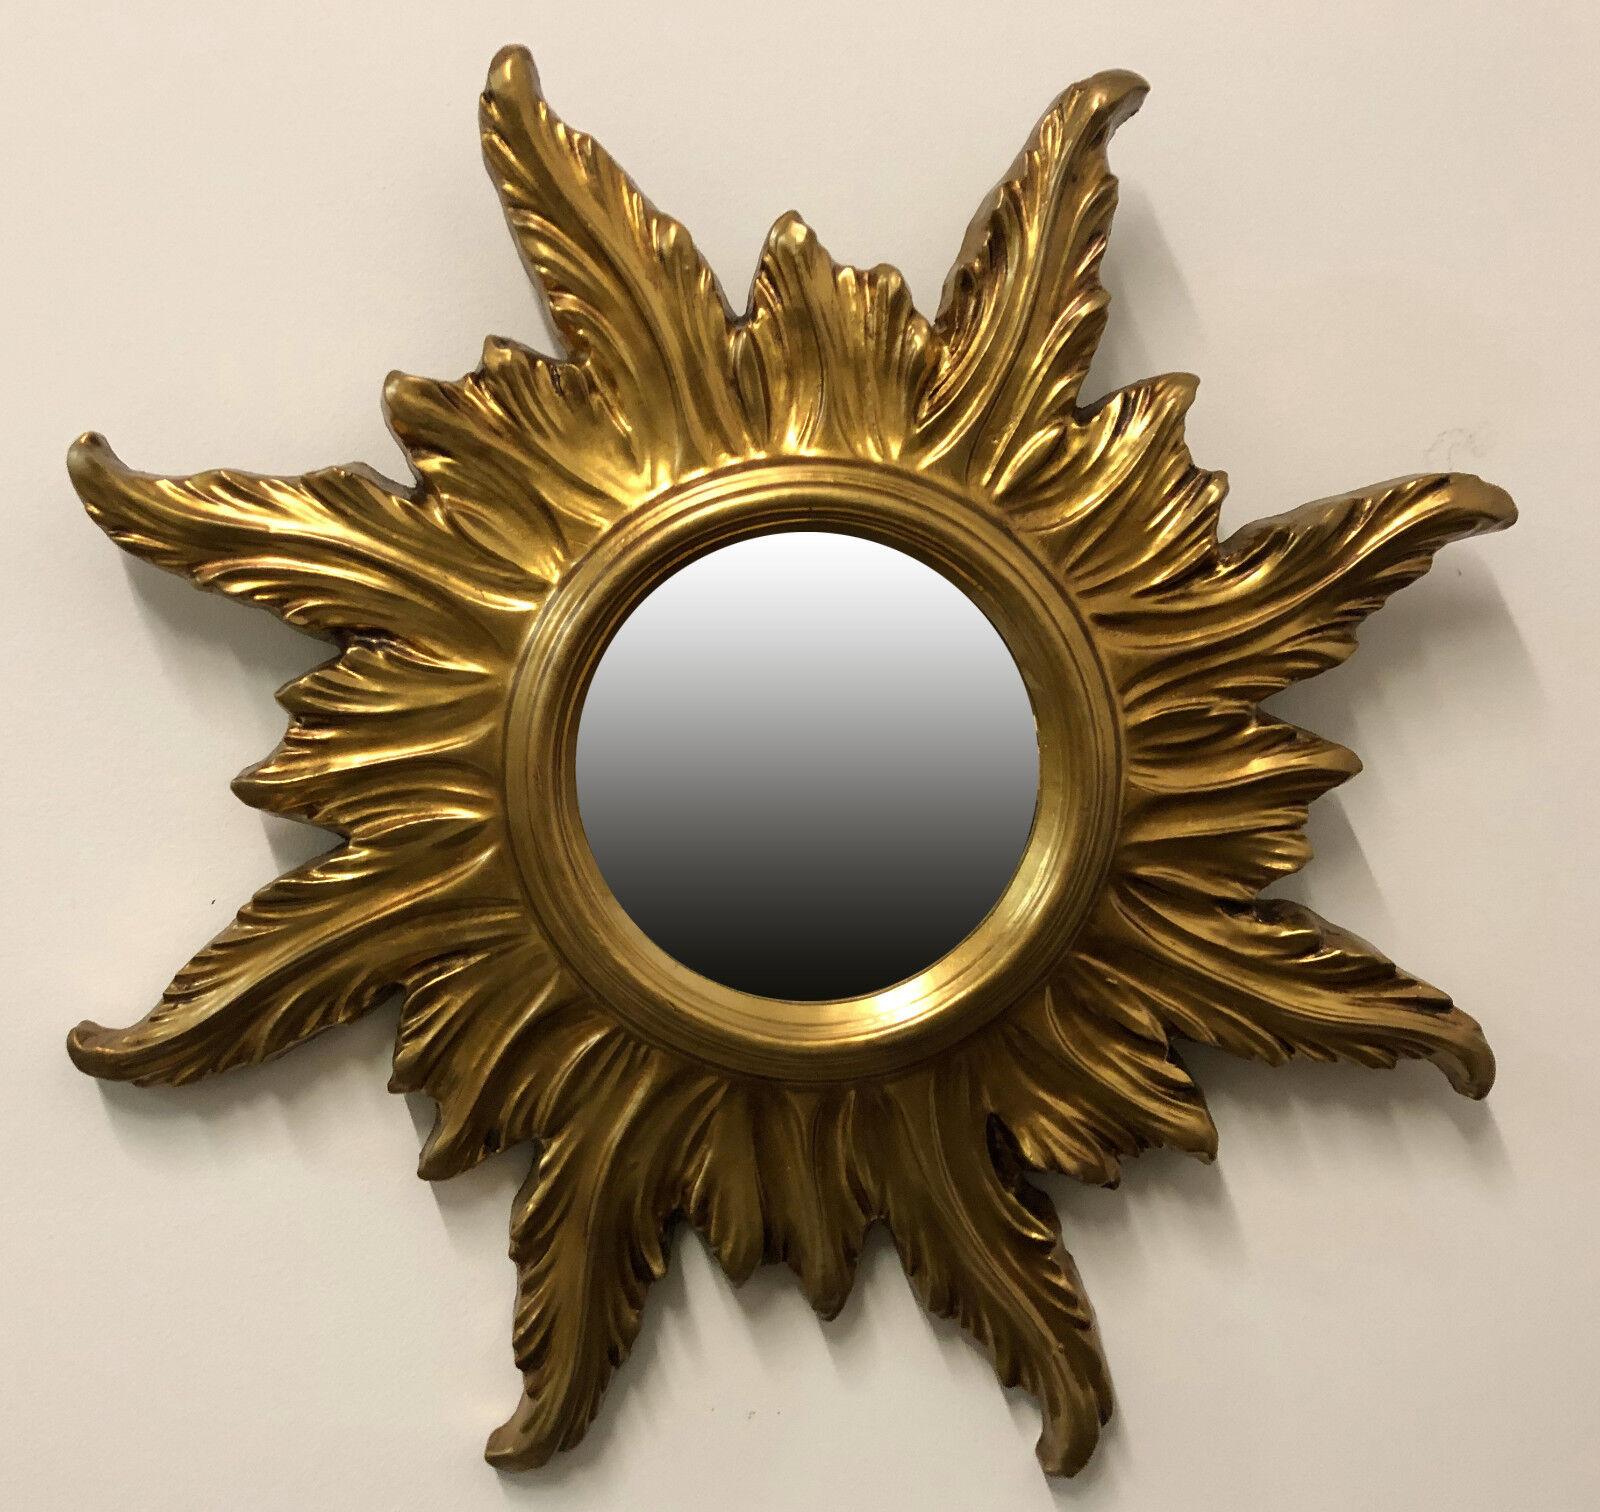 Wandspiegel spiegel barock antik sonne runder spiegel in gold 56x56 cm repro ebay - Runder spiegel gold ...